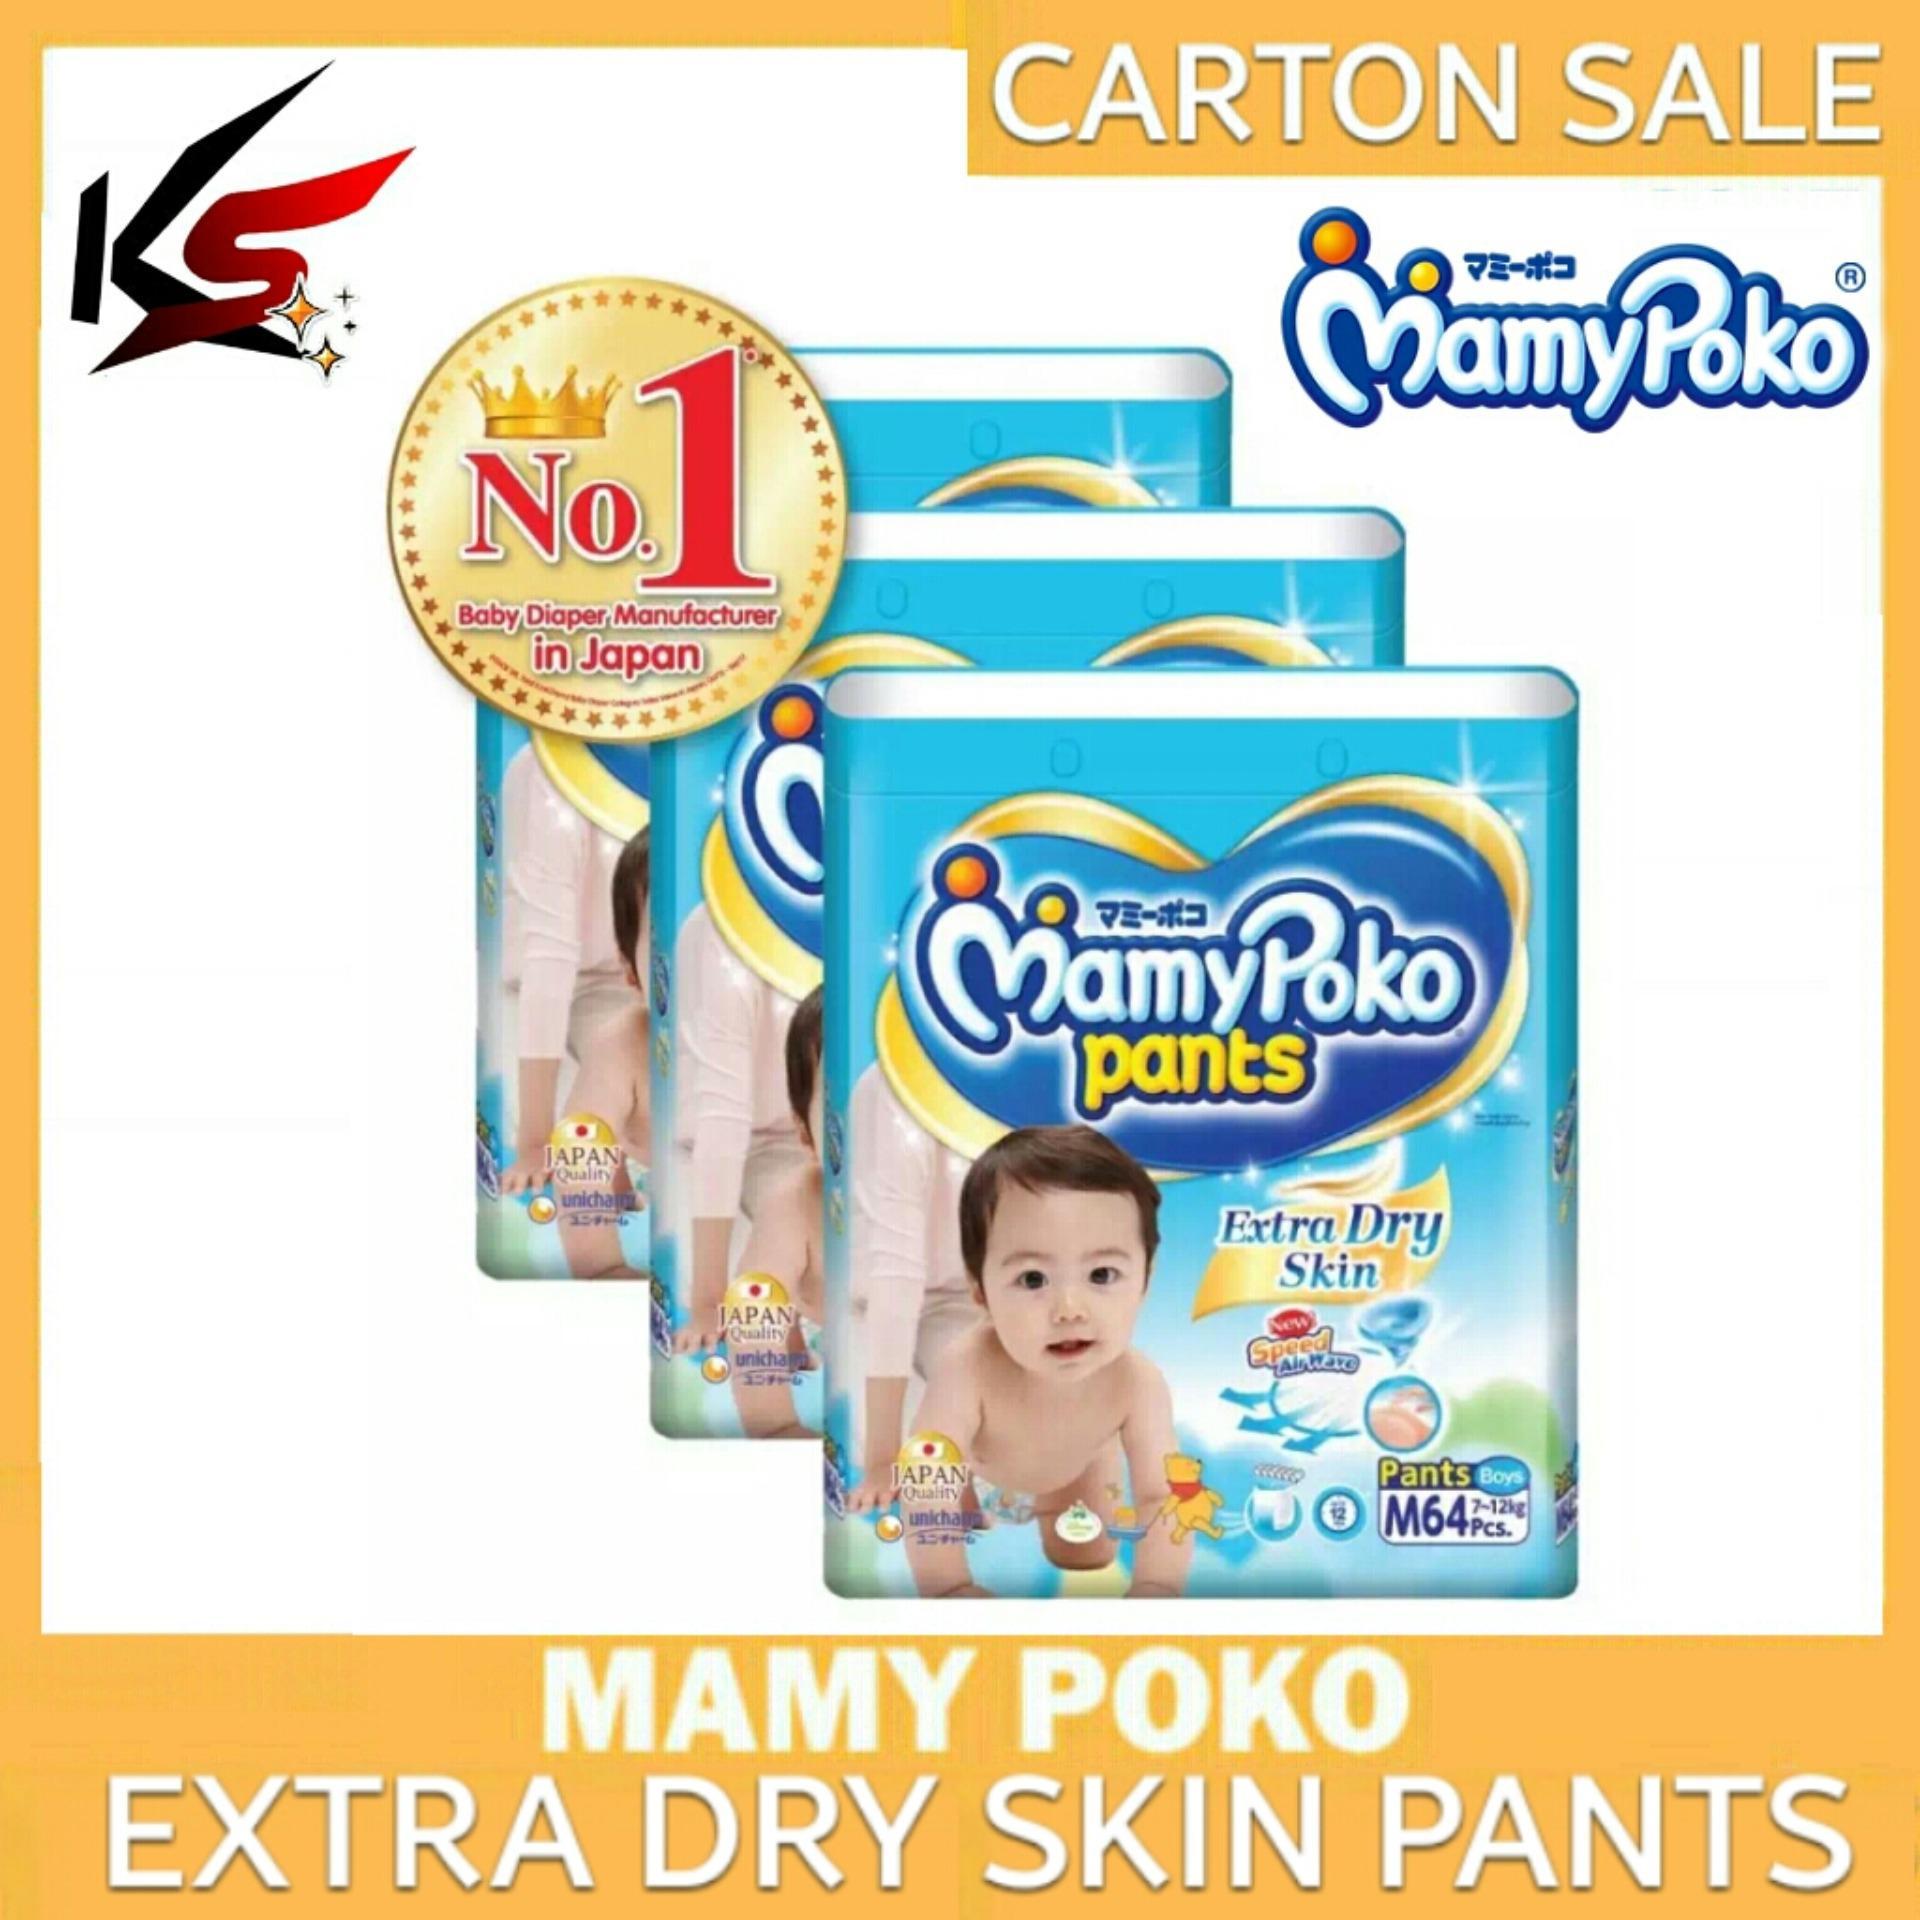 Columbia Hiking Pants Women Convertible Plus Price In Singapore Mamypoko Extra Soft Boys Xl 24 Dry Skin Carton Of 3 Packets Boy Size M 64pcs X